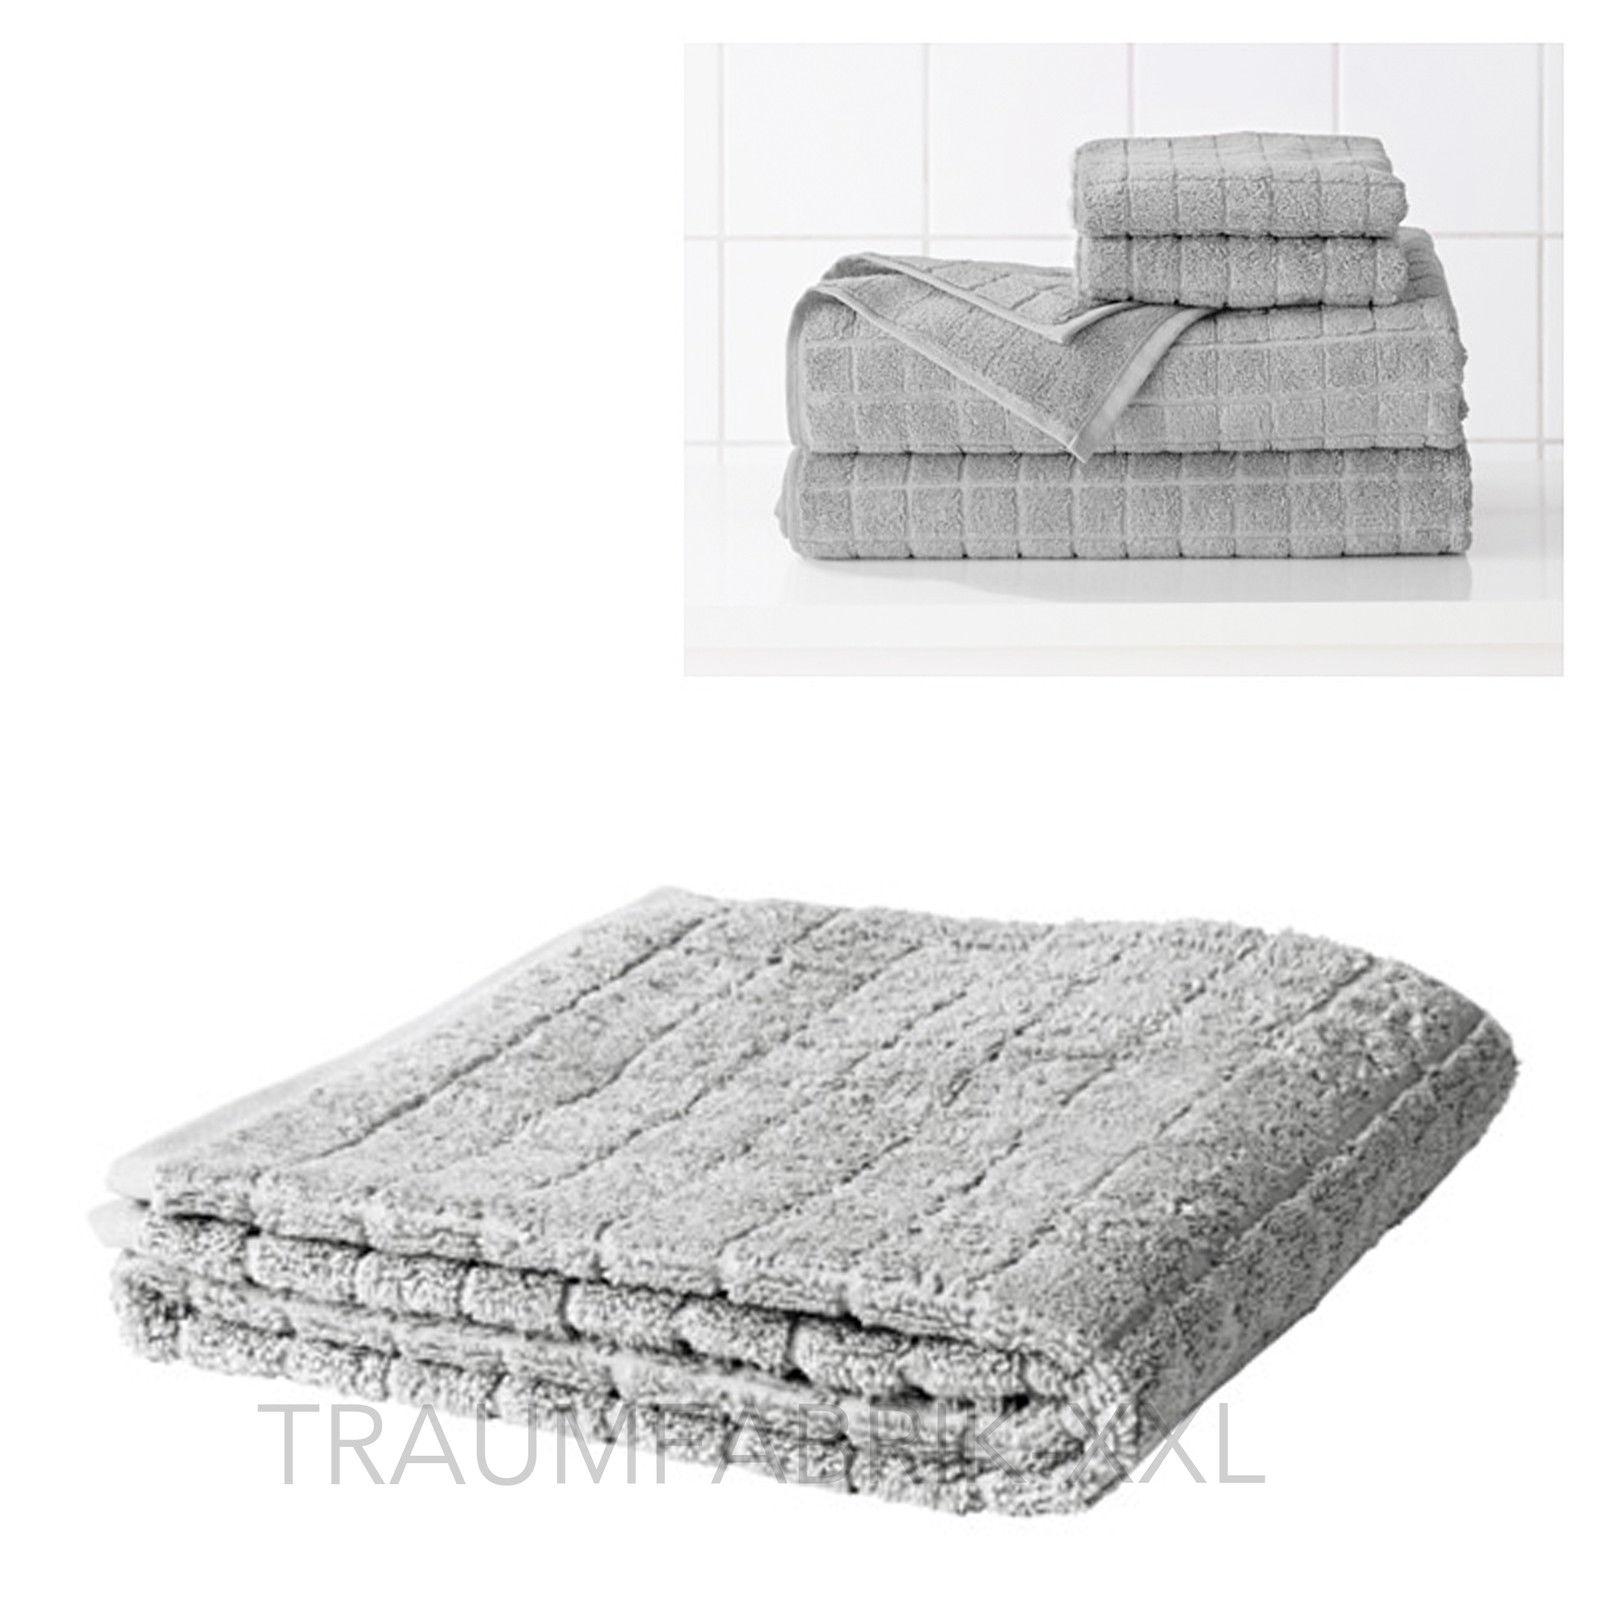 handt cher set ikea zuhause image idee. Black Bedroom Furniture Sets. Home Design Ideas